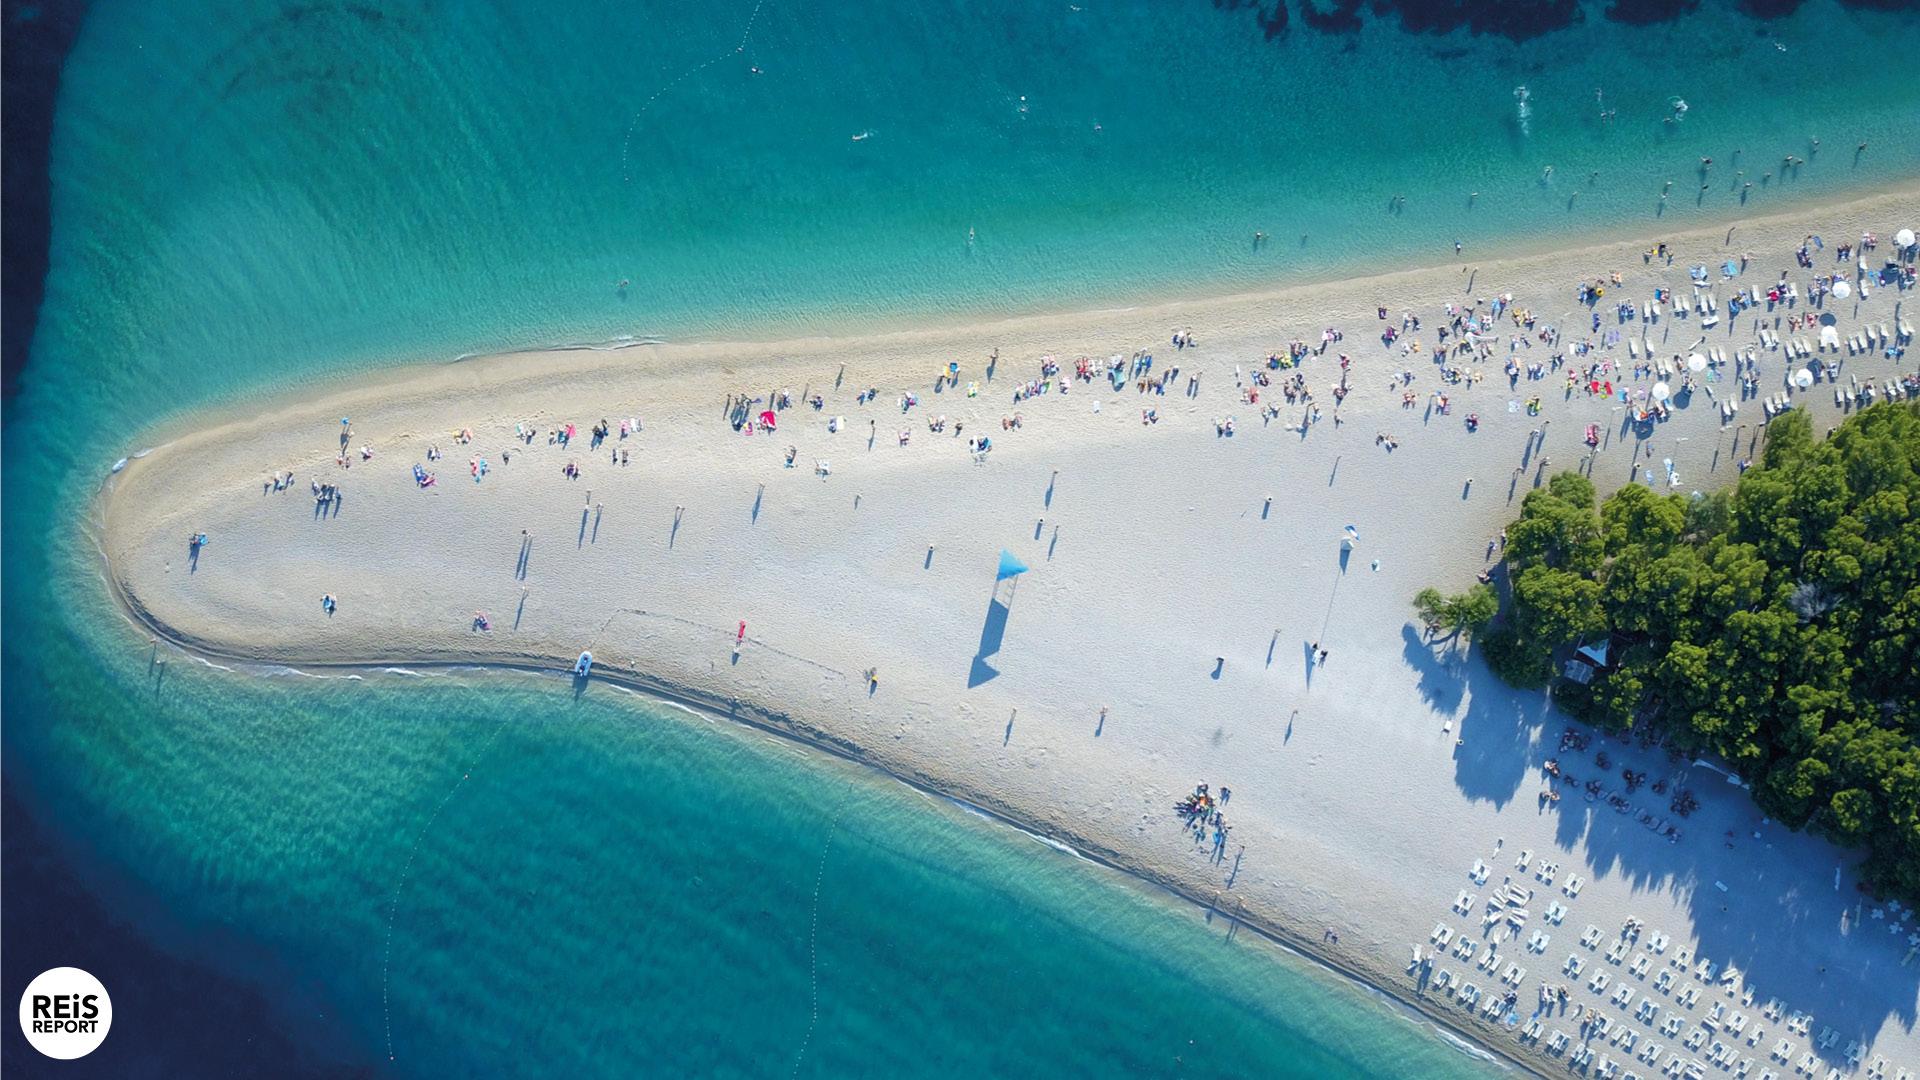 zlatni rat strand kroatie brac